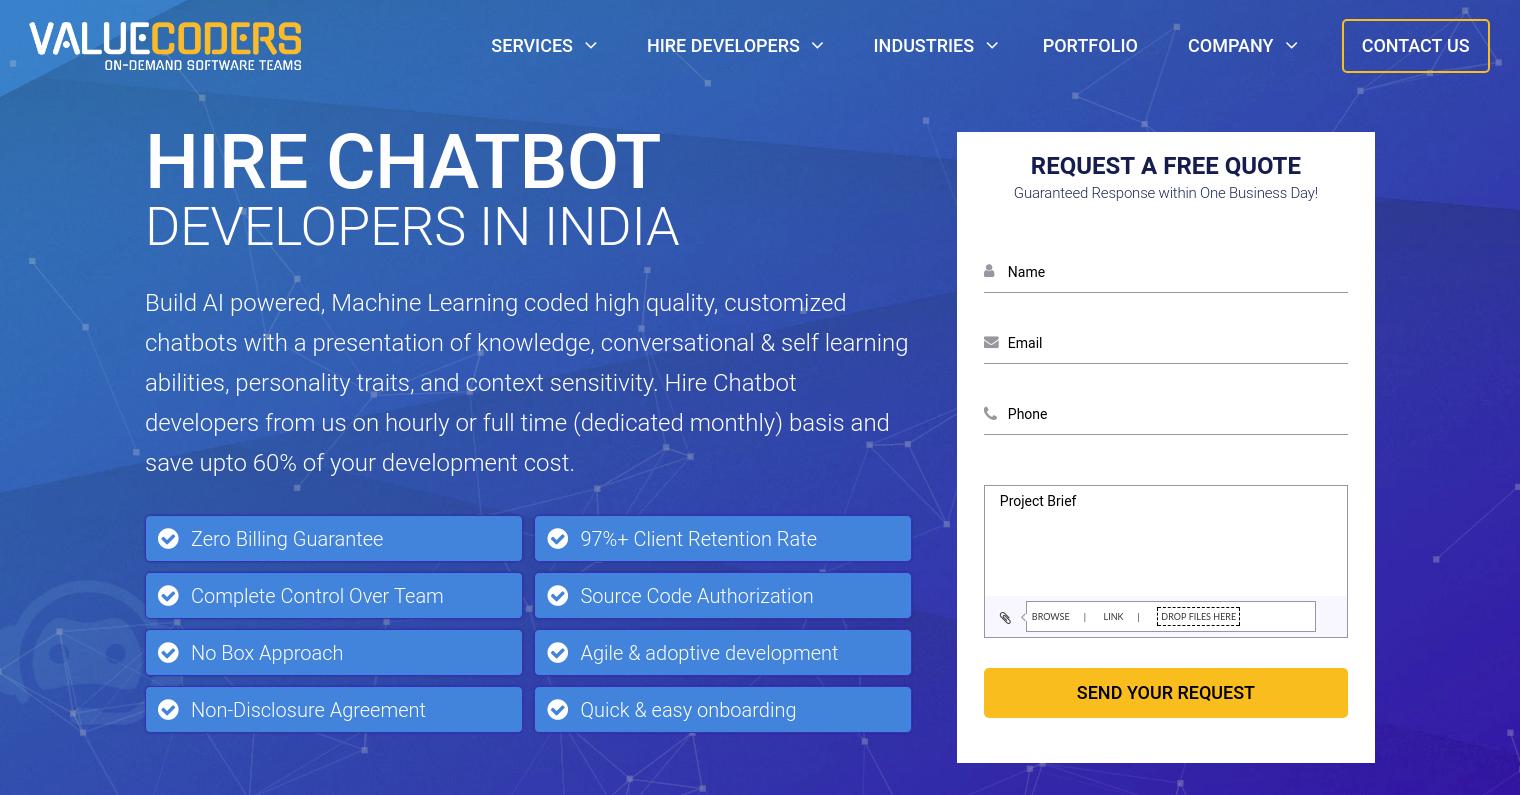 Top Development Companies To Build Intelligent Chatbots